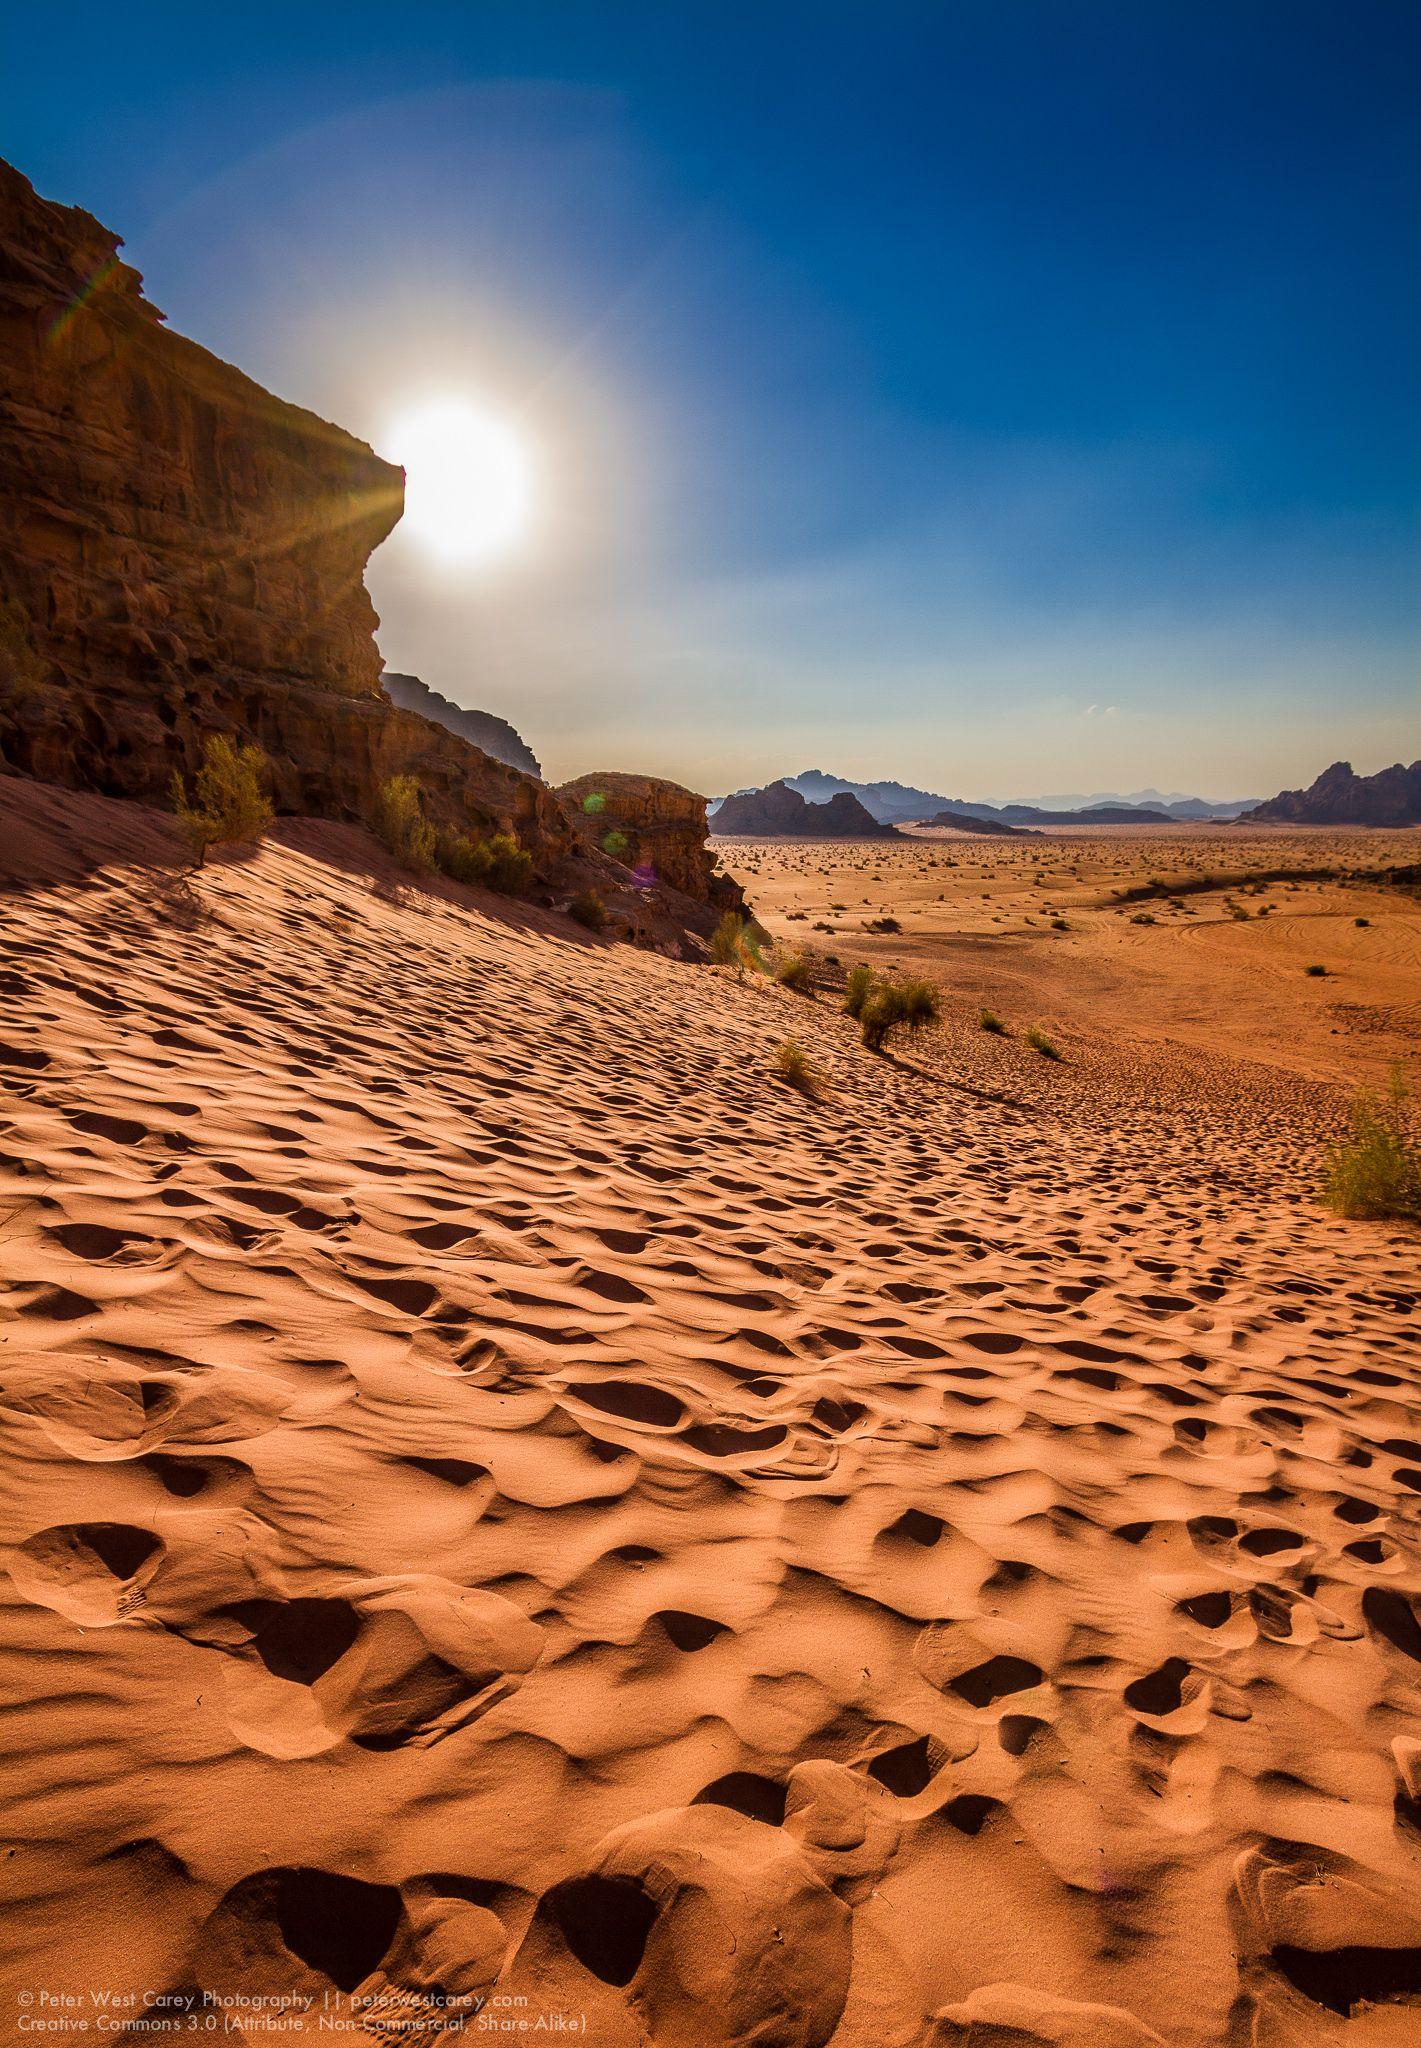 wadi rum desert jordan deserts dunes in 2018. Black Bedroom Furniture Sets. Home Design Ideas